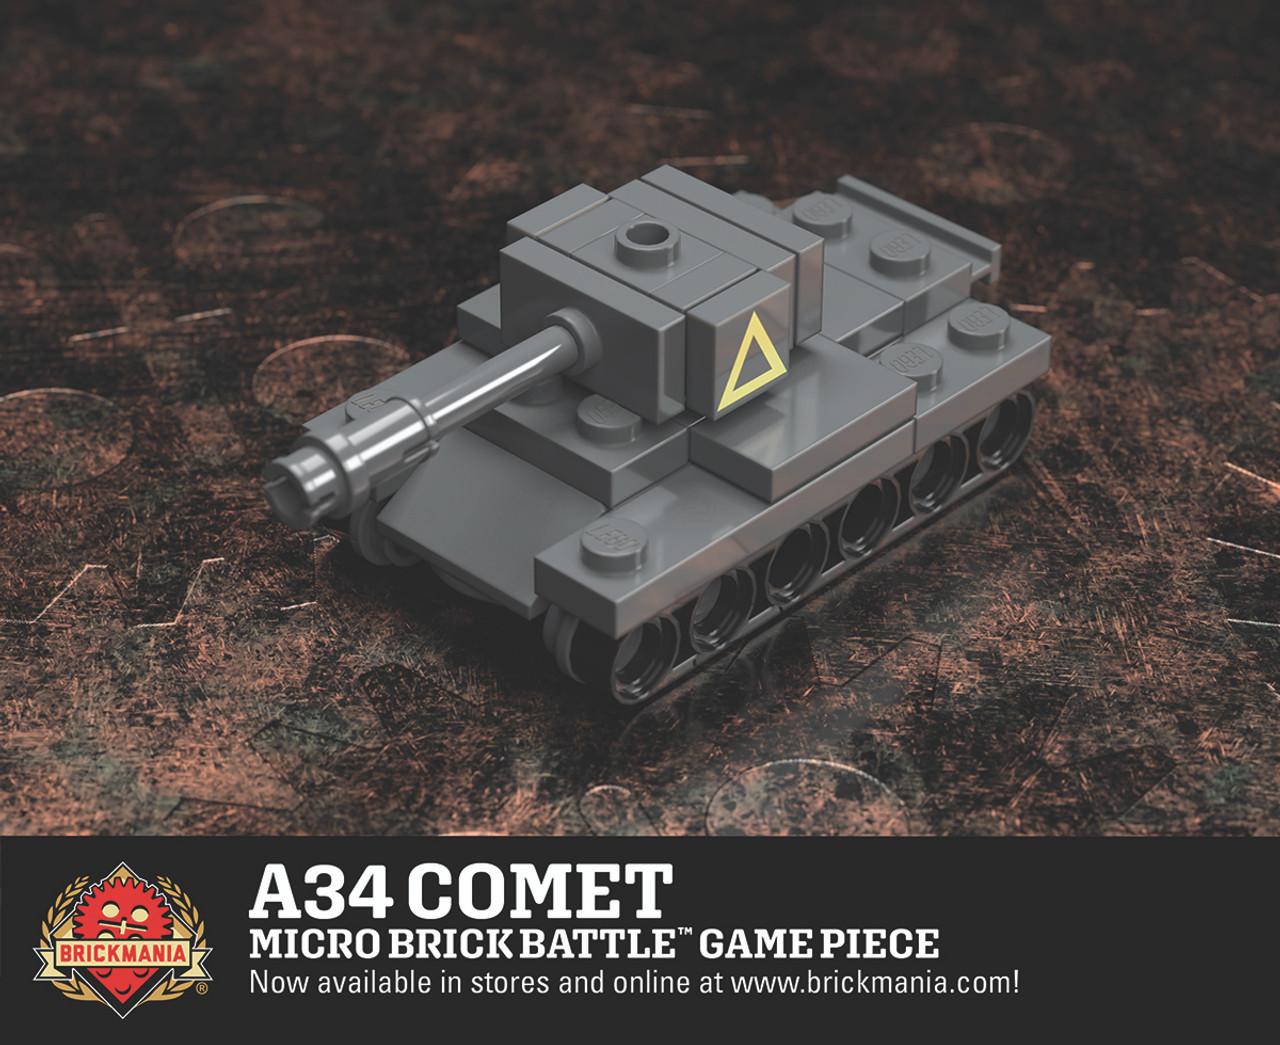 A34 Comet - Micro Brick Battle Game Piece